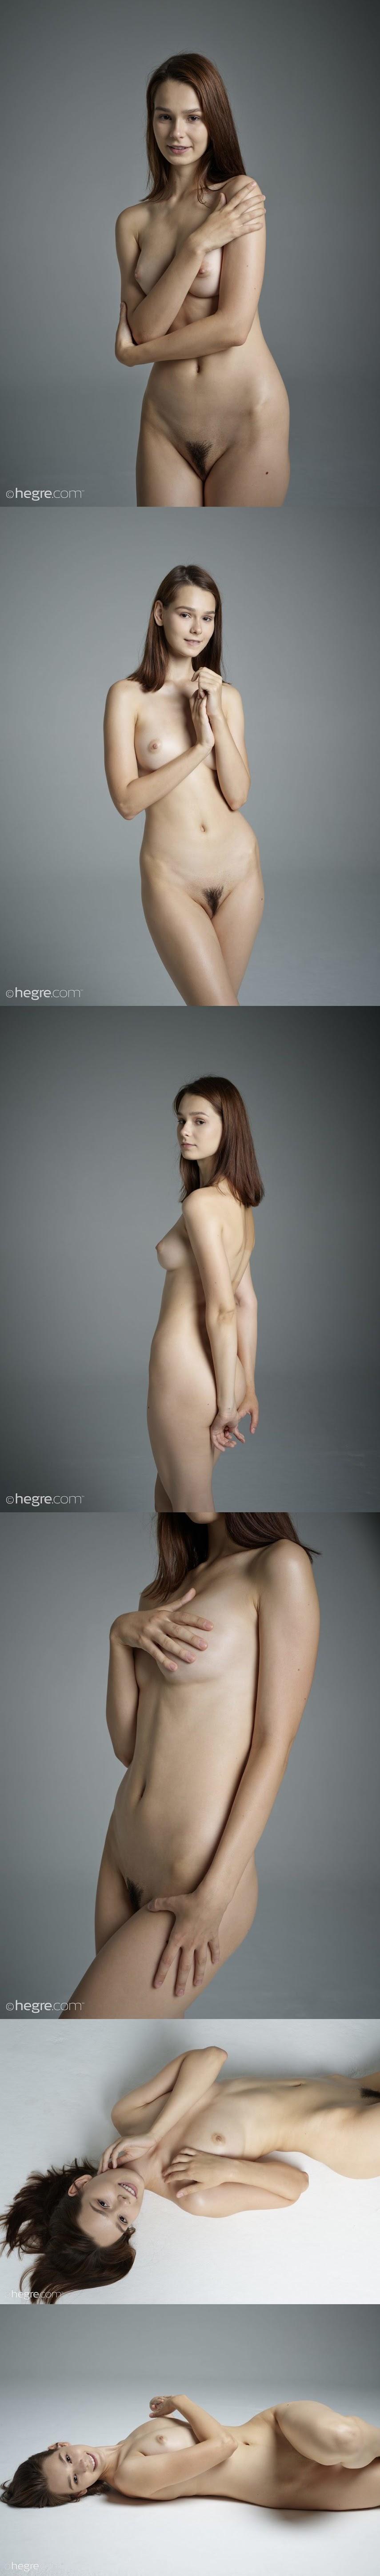 [Art] Tasha (Irina Telicheva) - Classic Nudes